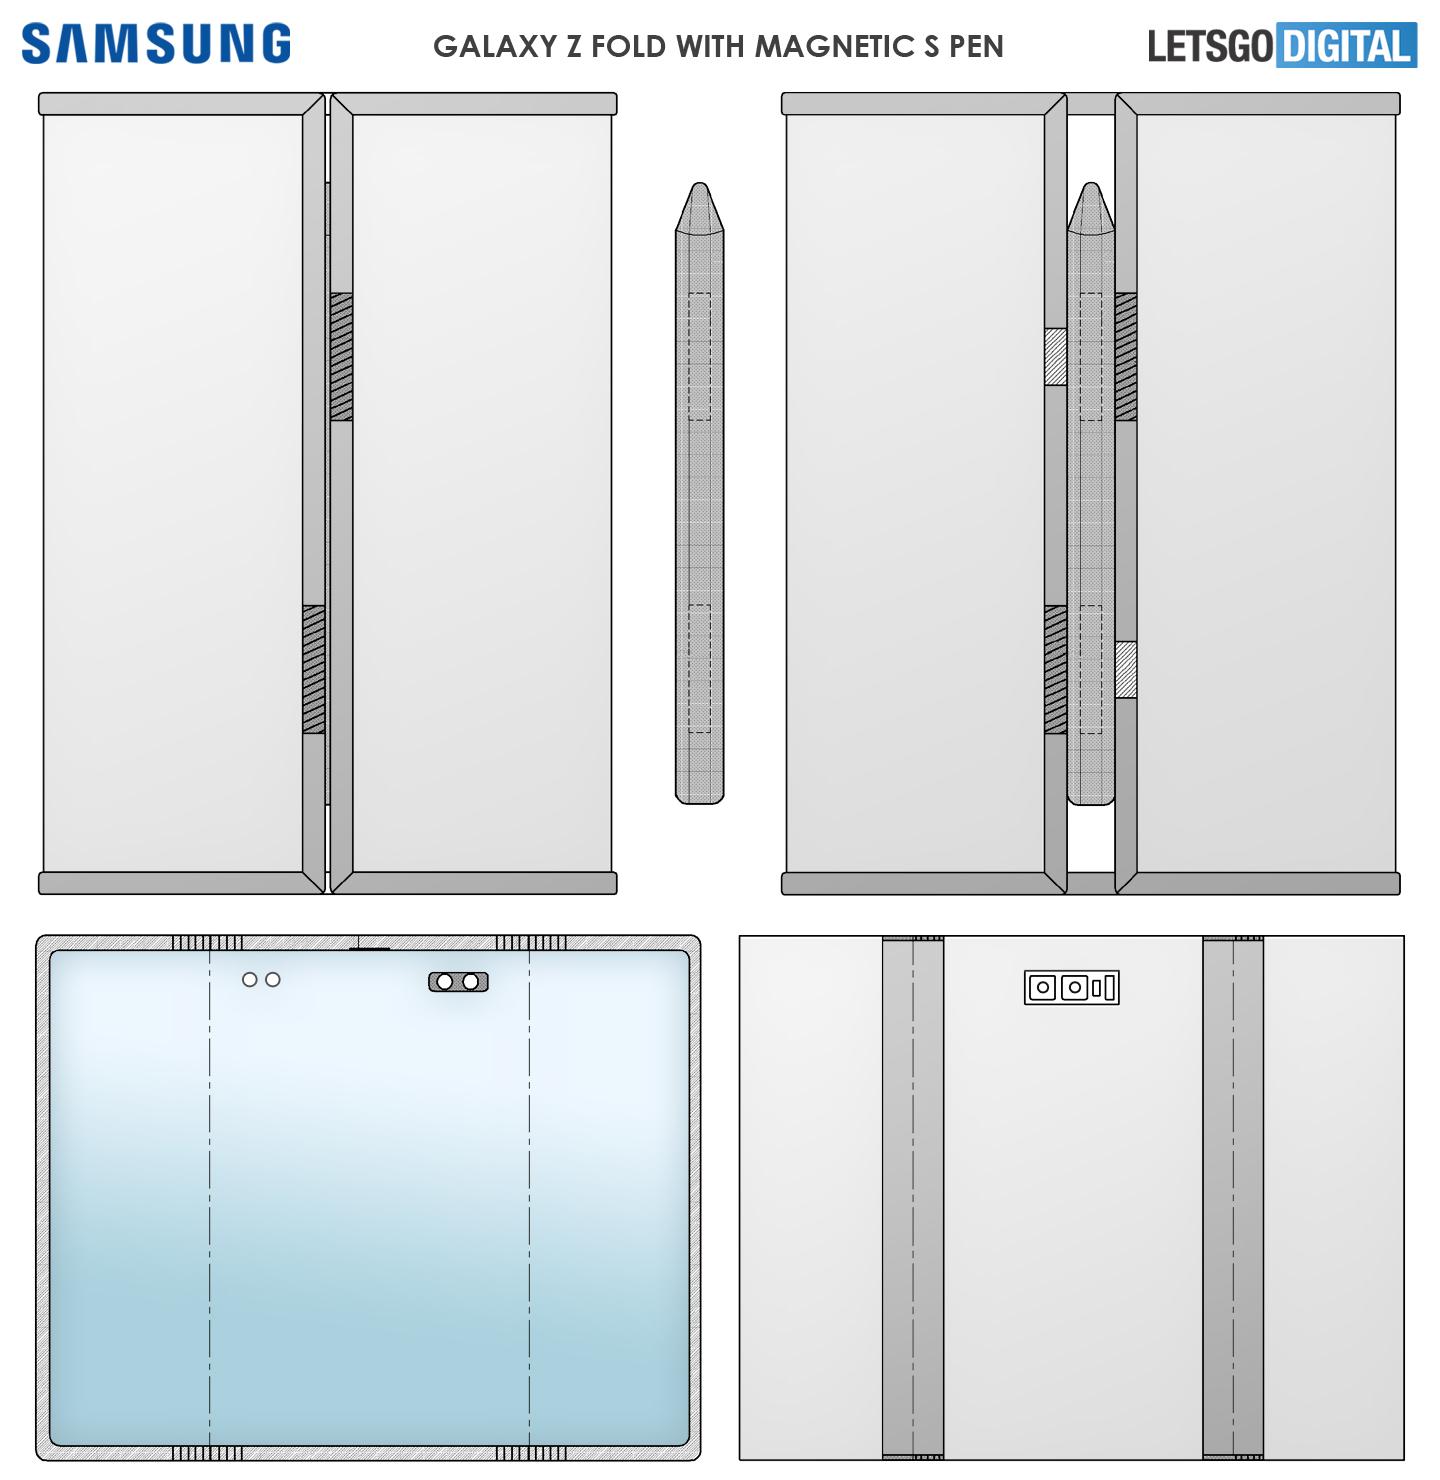 Samsung Galaxy Z Fold Tab Dual Foldable Patent Selfie Camera